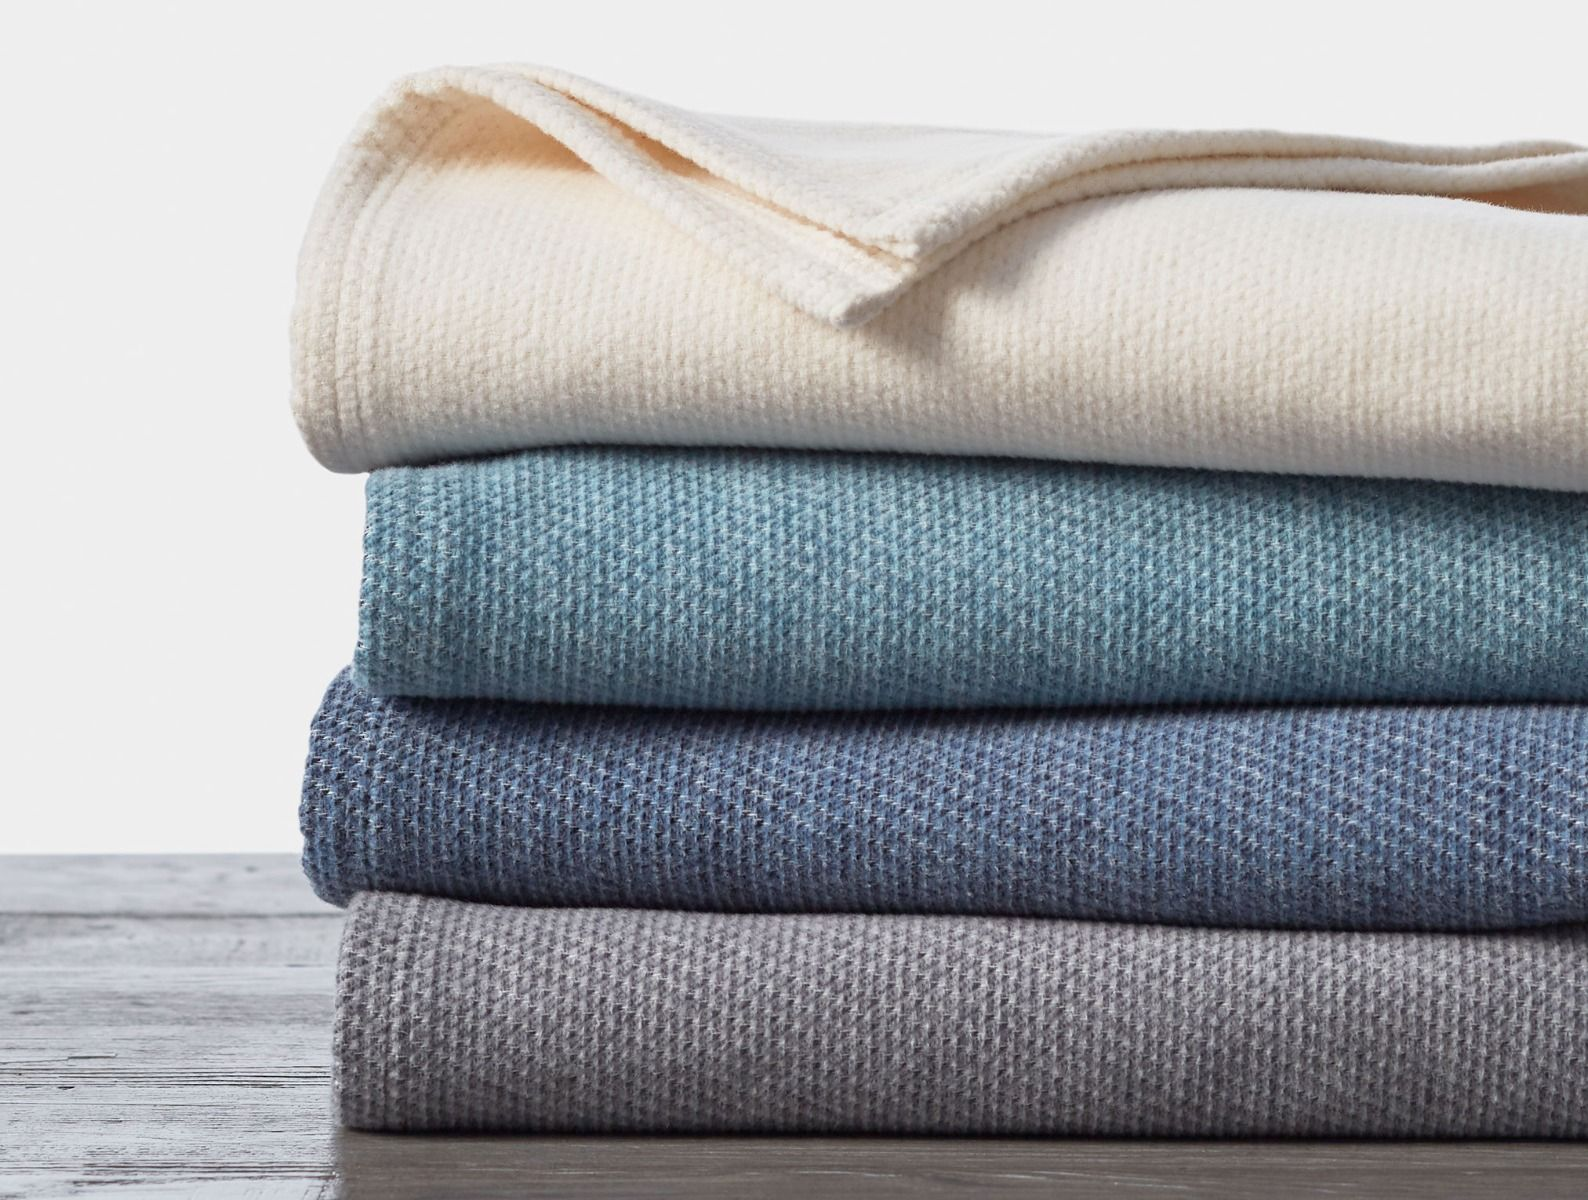 Coyuchi Sequoia Washable Organic Cotton Wool Blanket Full Queen Undyed Organic Cotton Blanket Organic Blankets Organic Cotton Sheets